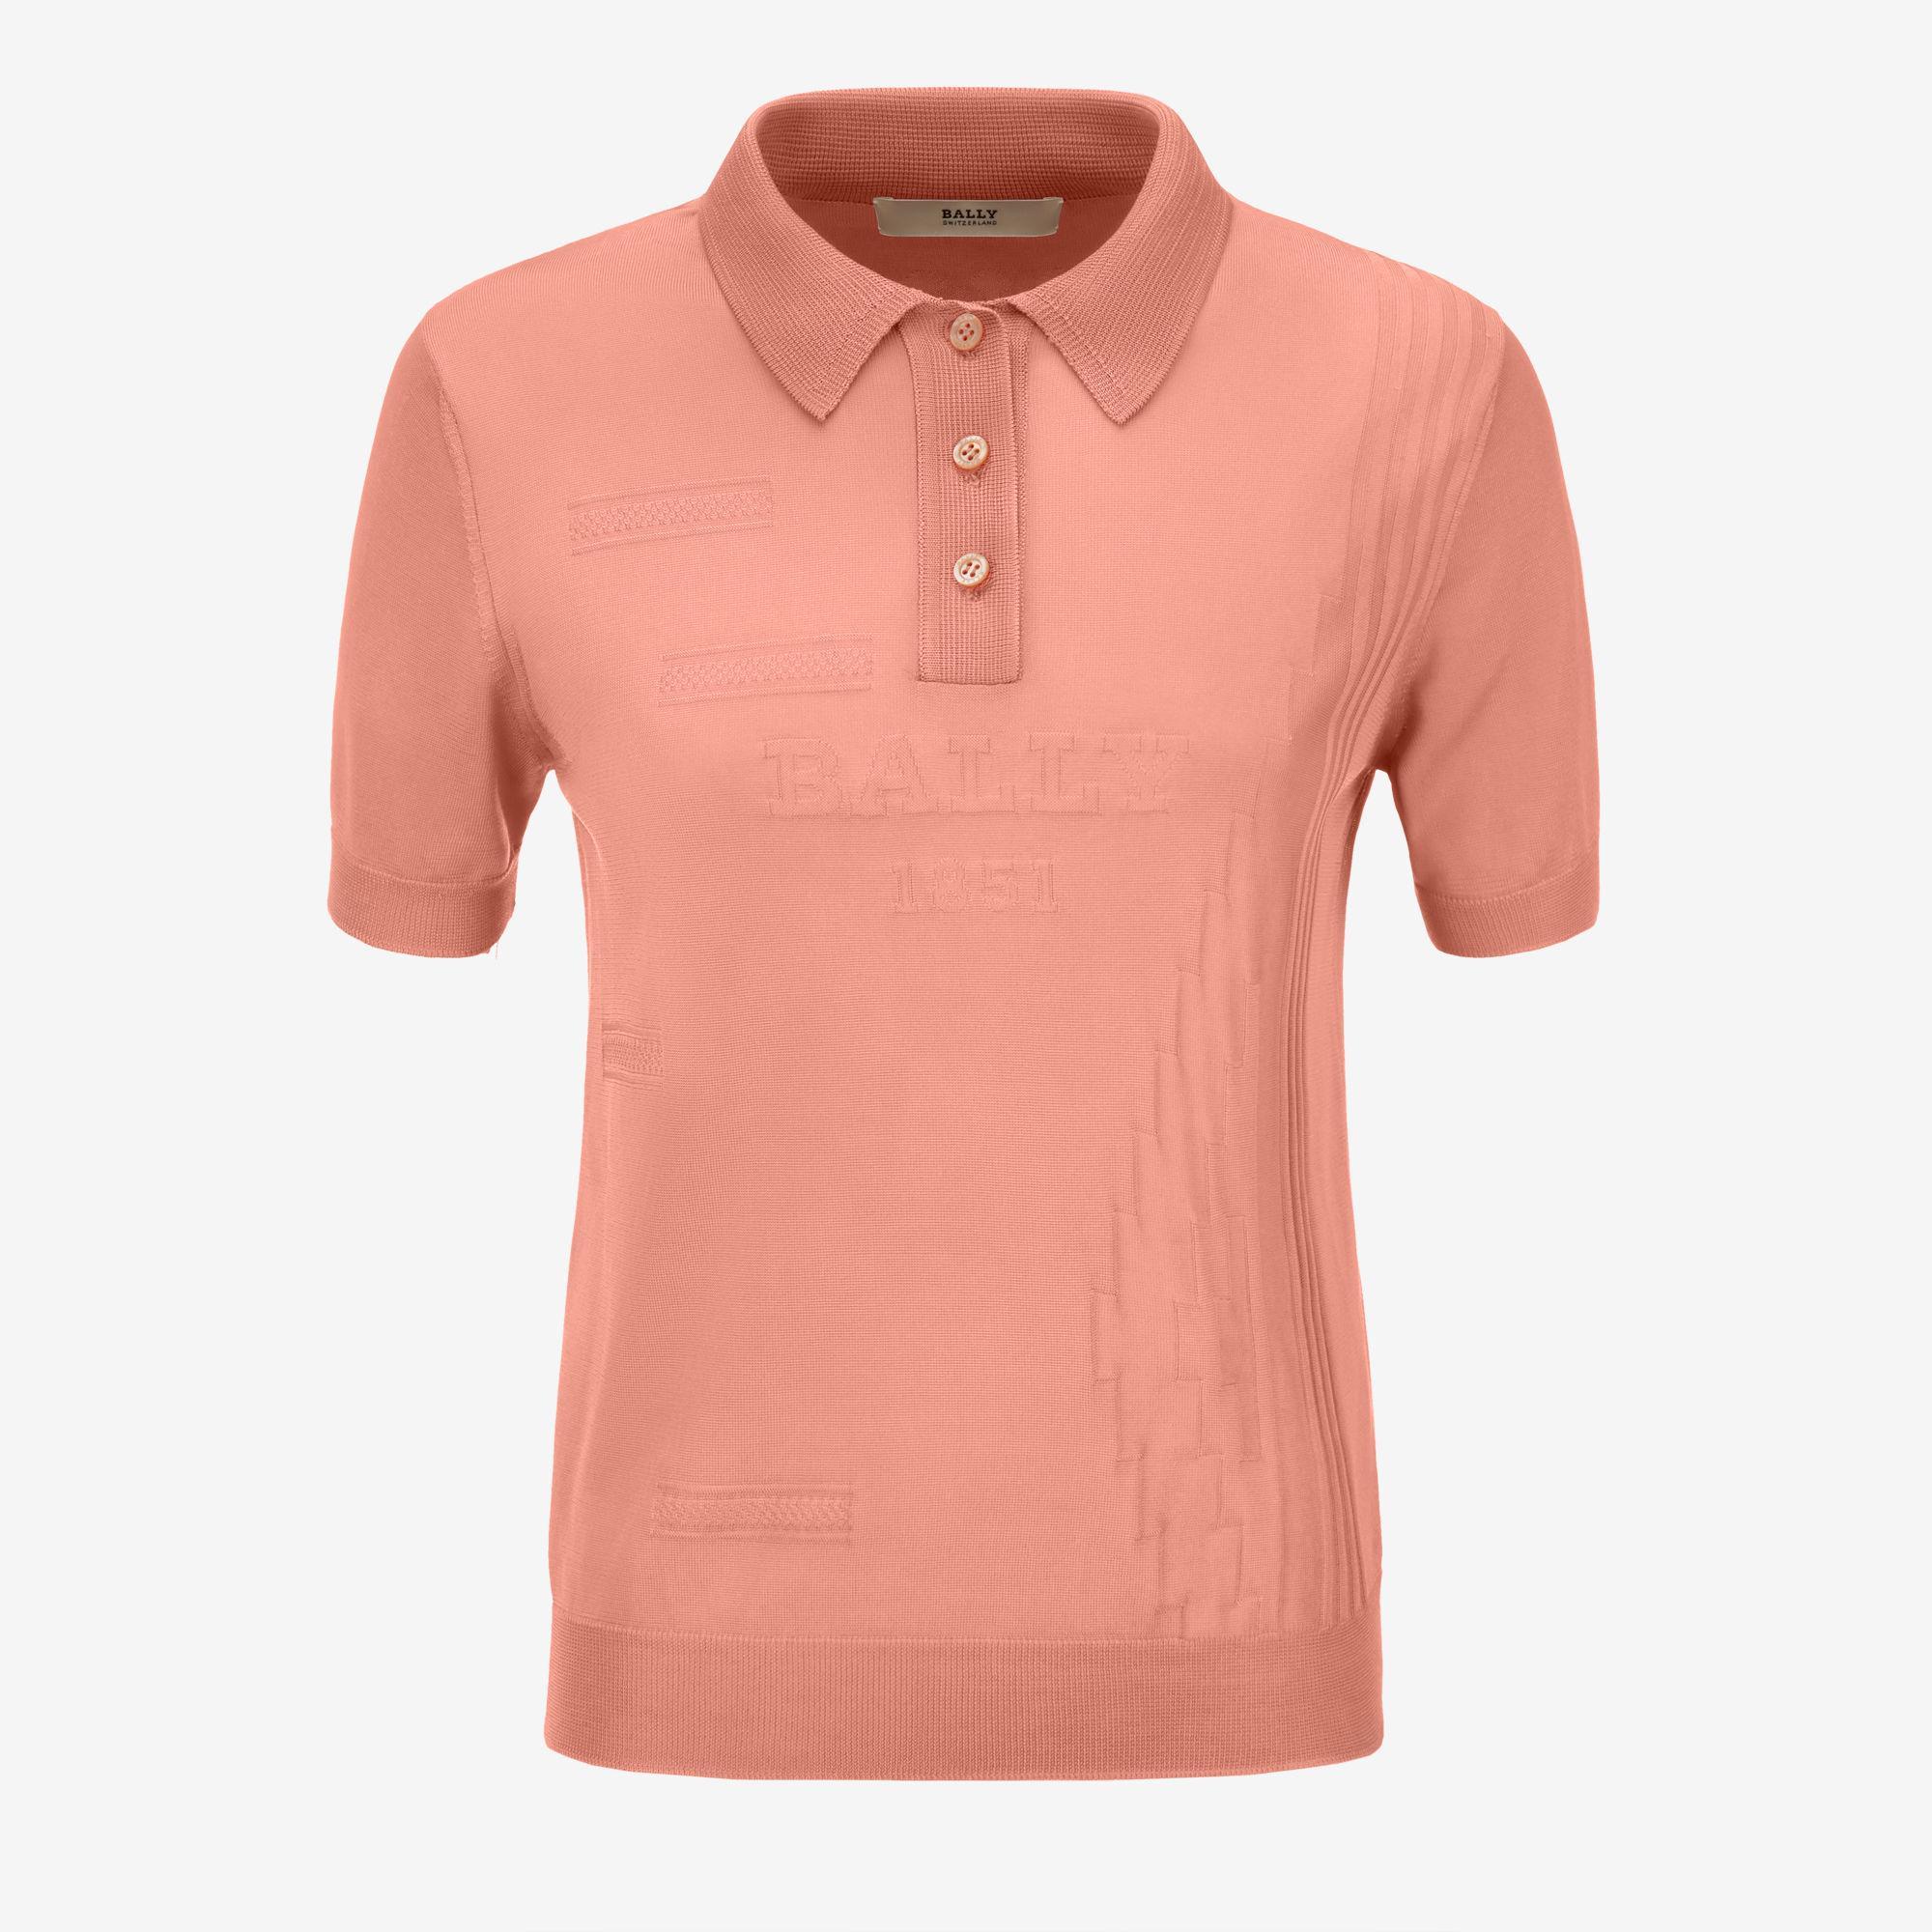 1f1e3b3c Bally - Pink Viscose Knit Polo Shirt for Men - Lyst. View fullscreen